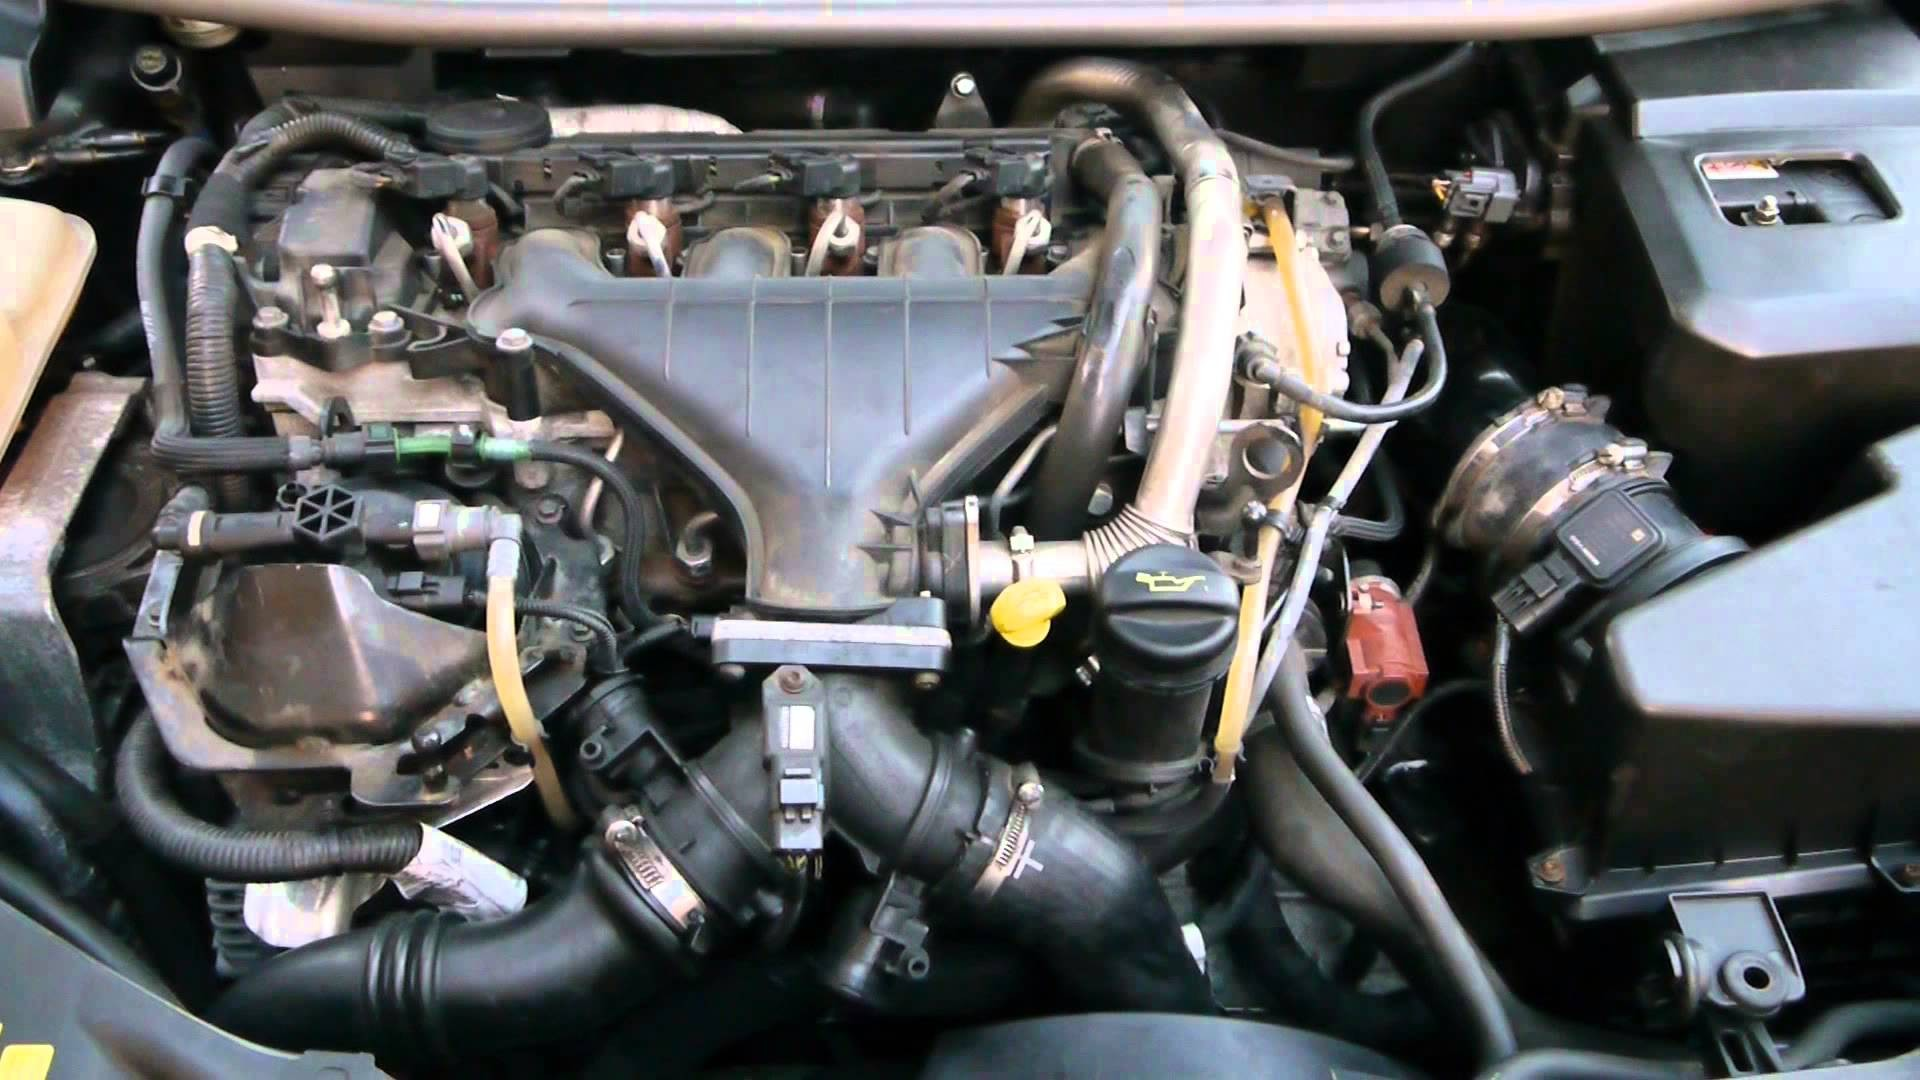 [DIAGRAM_5FD]  WRG-1178] Volvo V40 Engine Diagram | Volvo V40 Engine Diagram |  | mx.tl